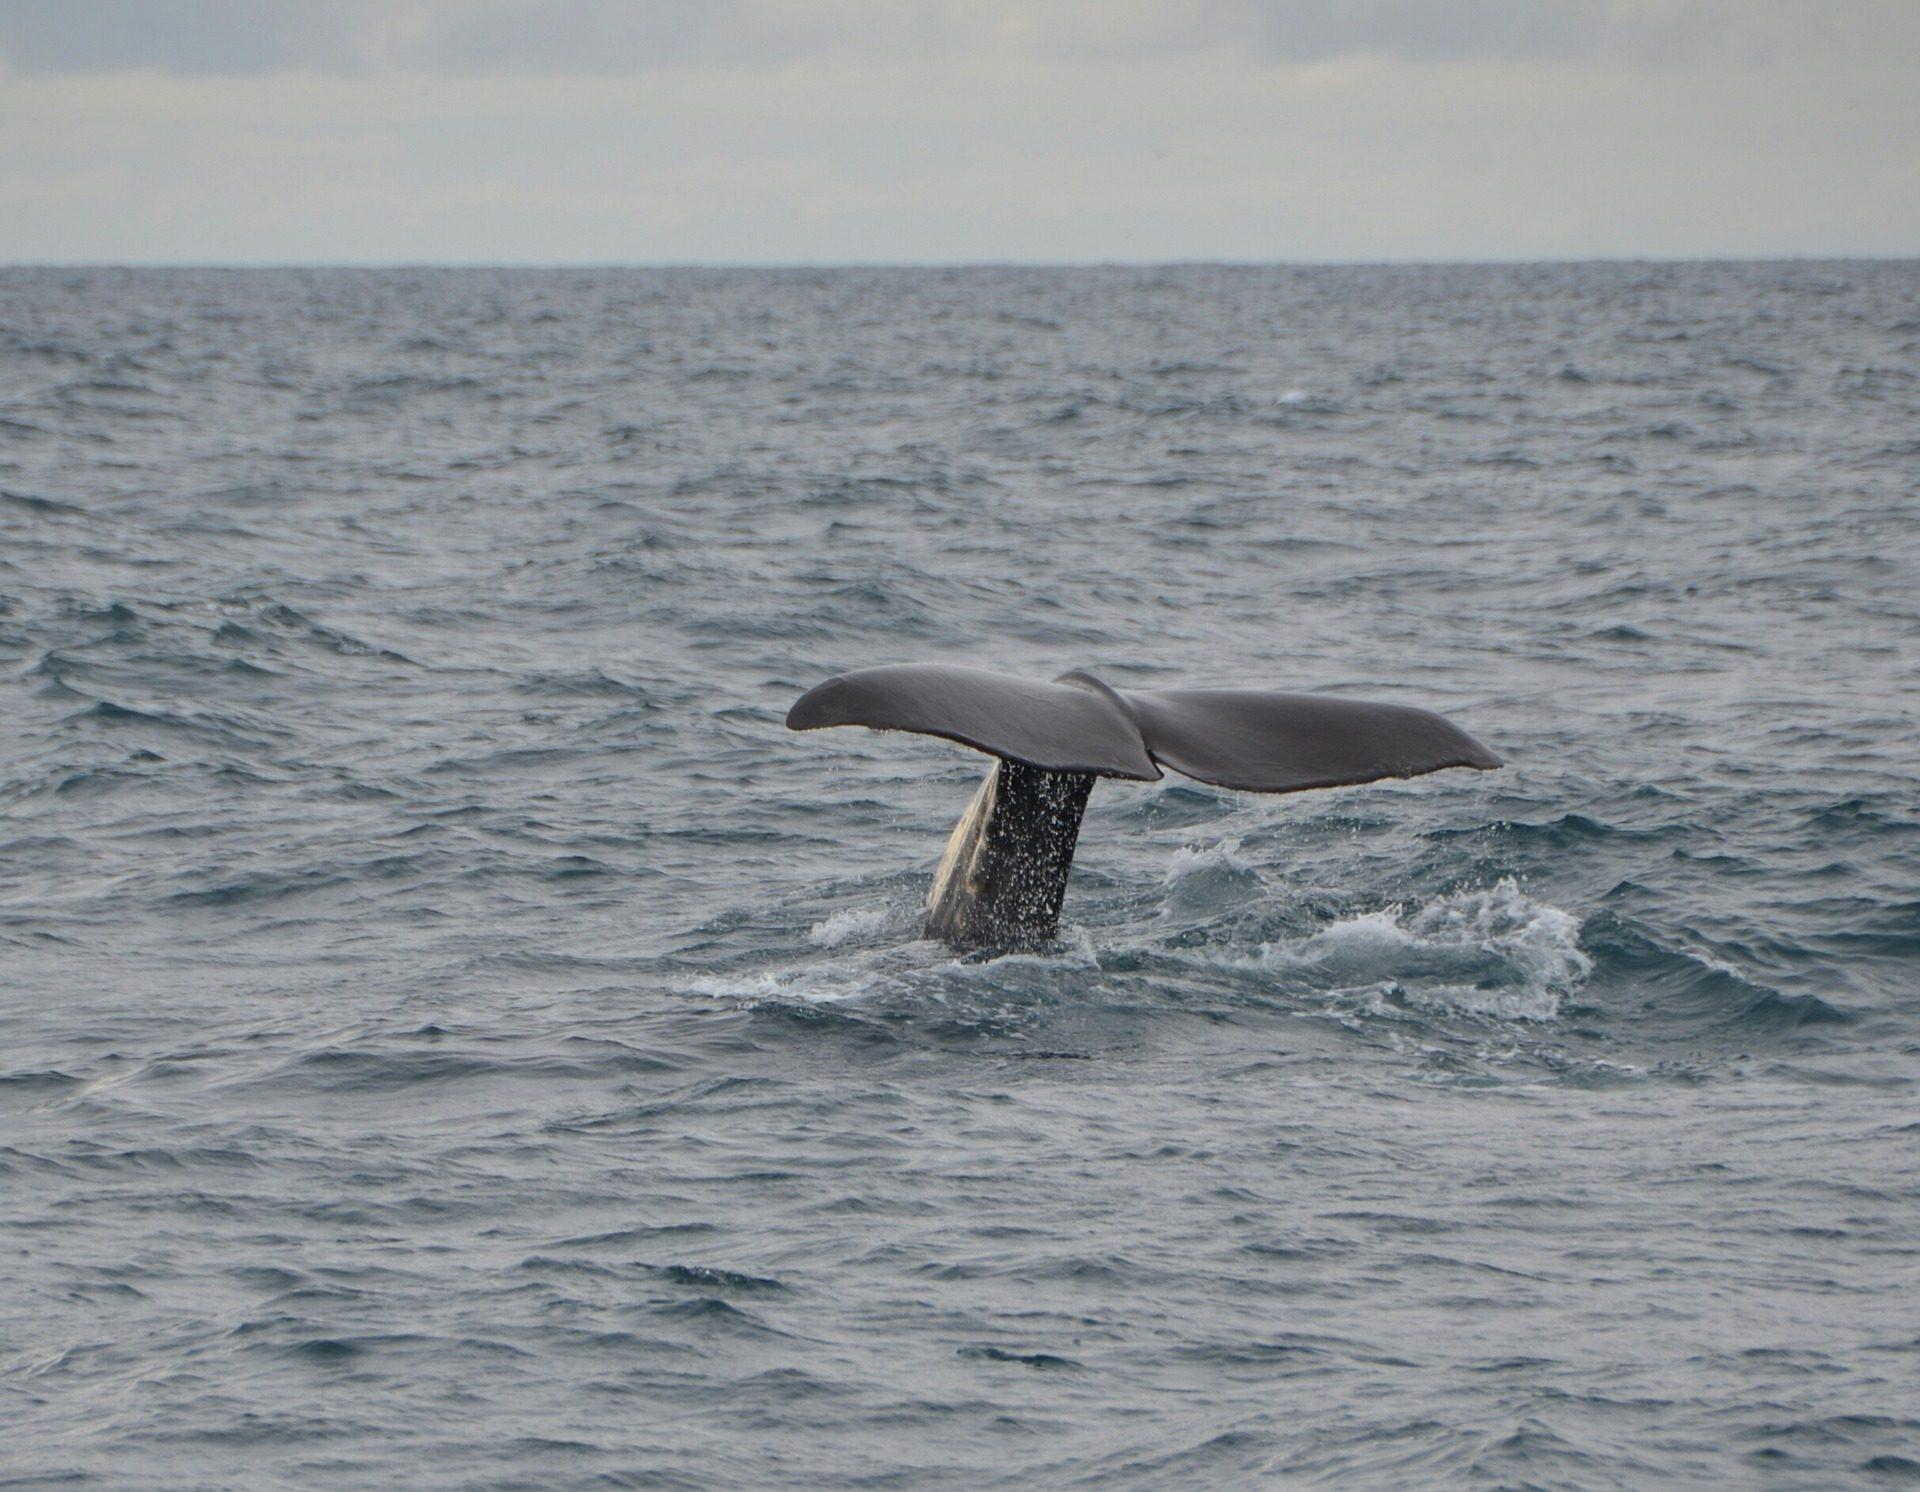 mar, 海, クジラ, 尾, フィン - HD の壁紙 - 教授-falken.com